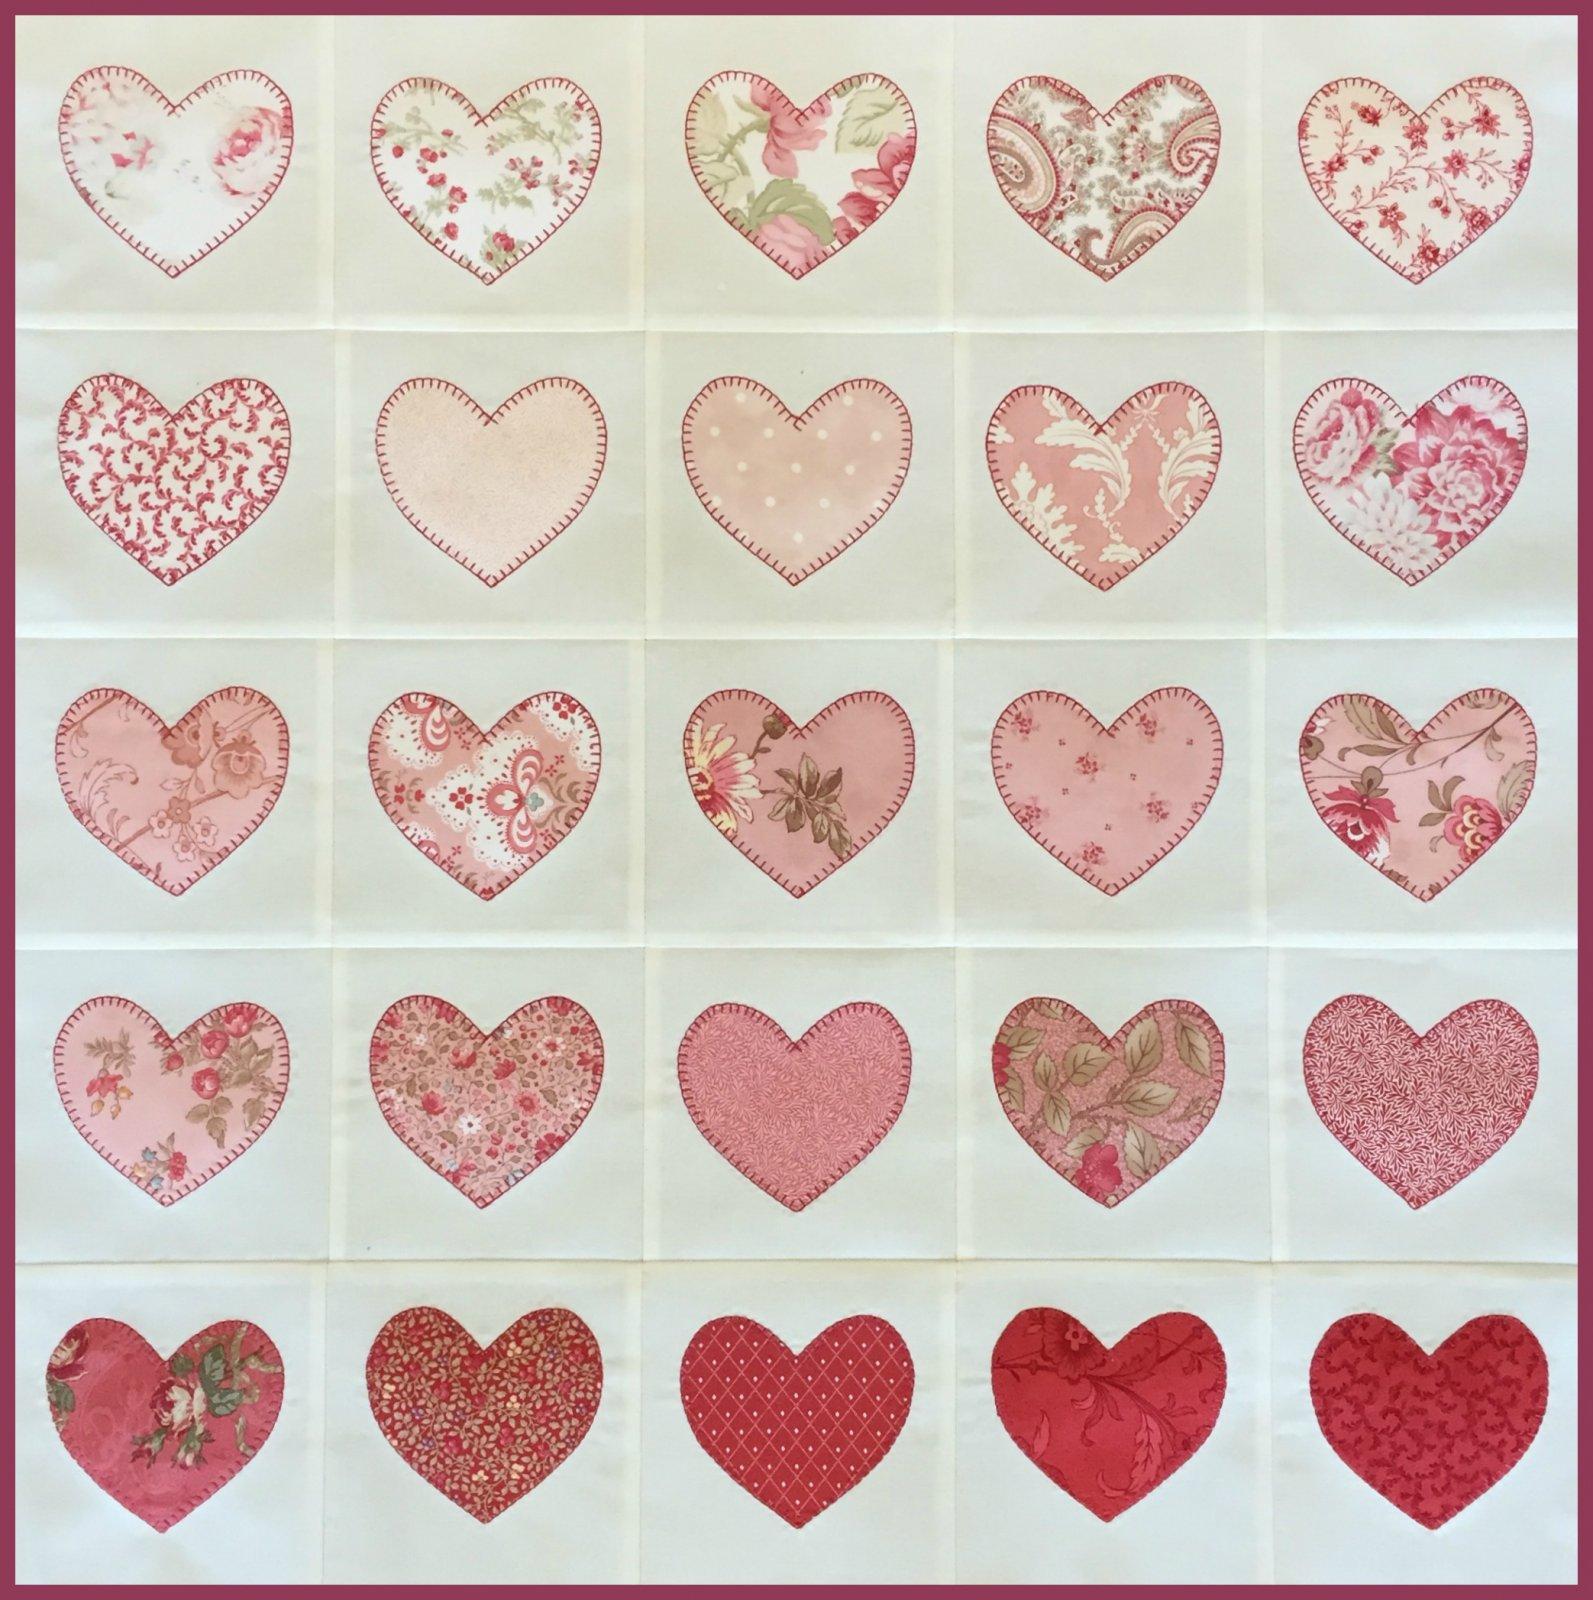 Pink Heart Kit